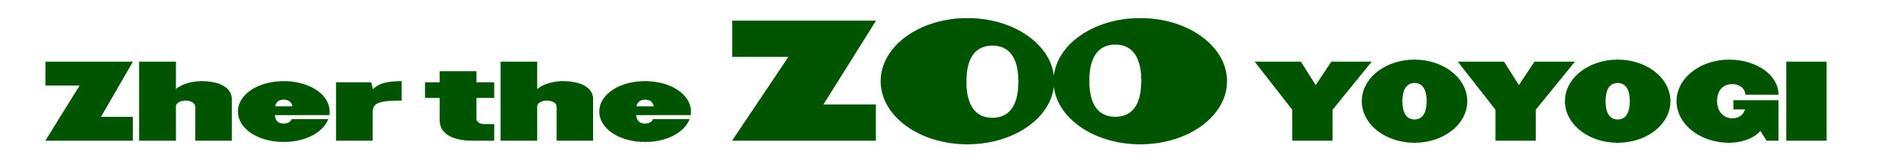 Zher the ZOO YOYOGI